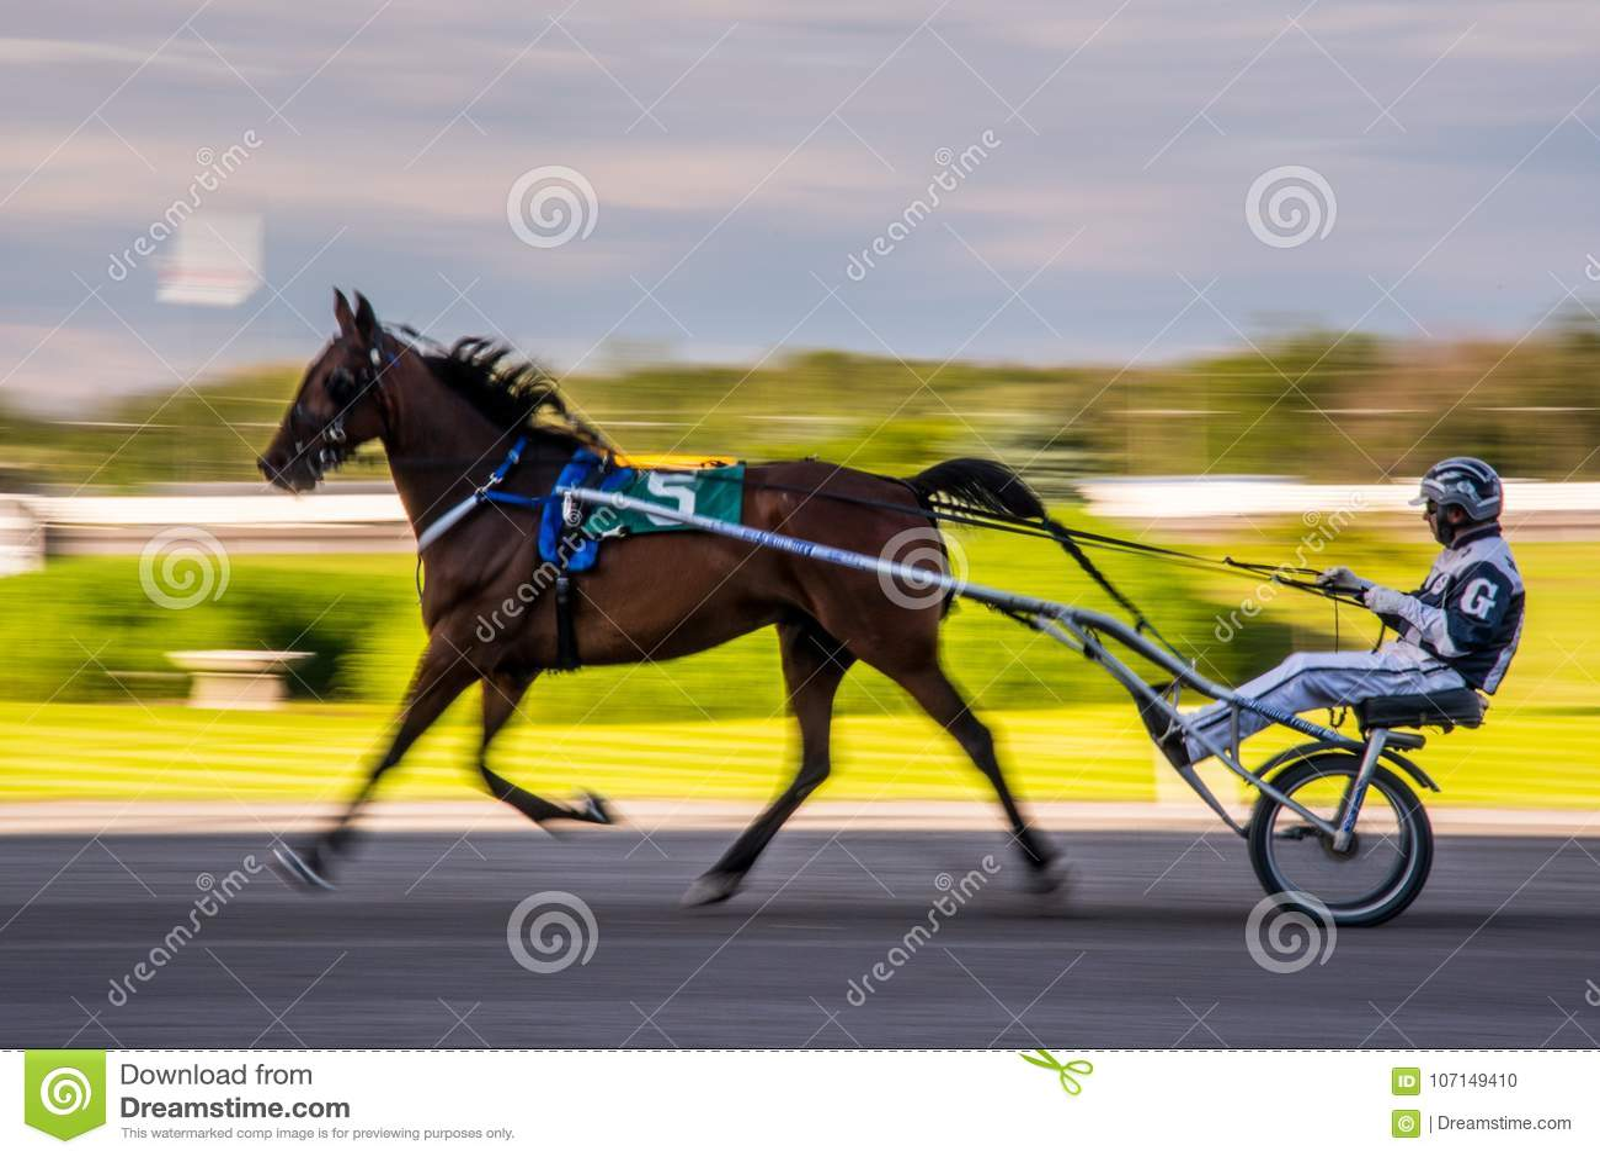 Ottawa Horse Racing